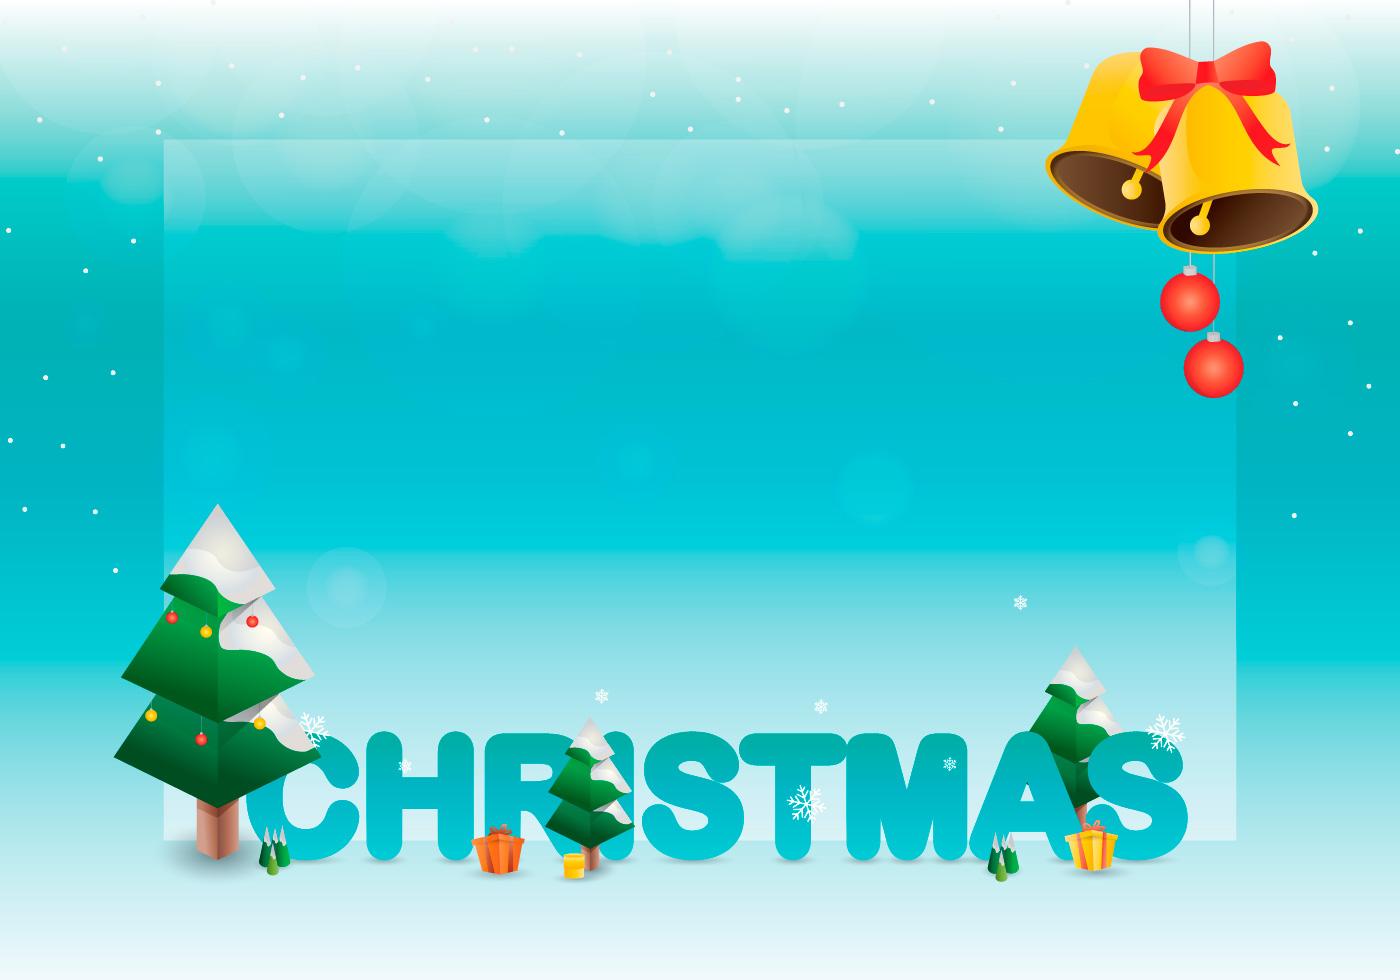 Sapin Tree Christmas Greetings Template Download Free Vector Art